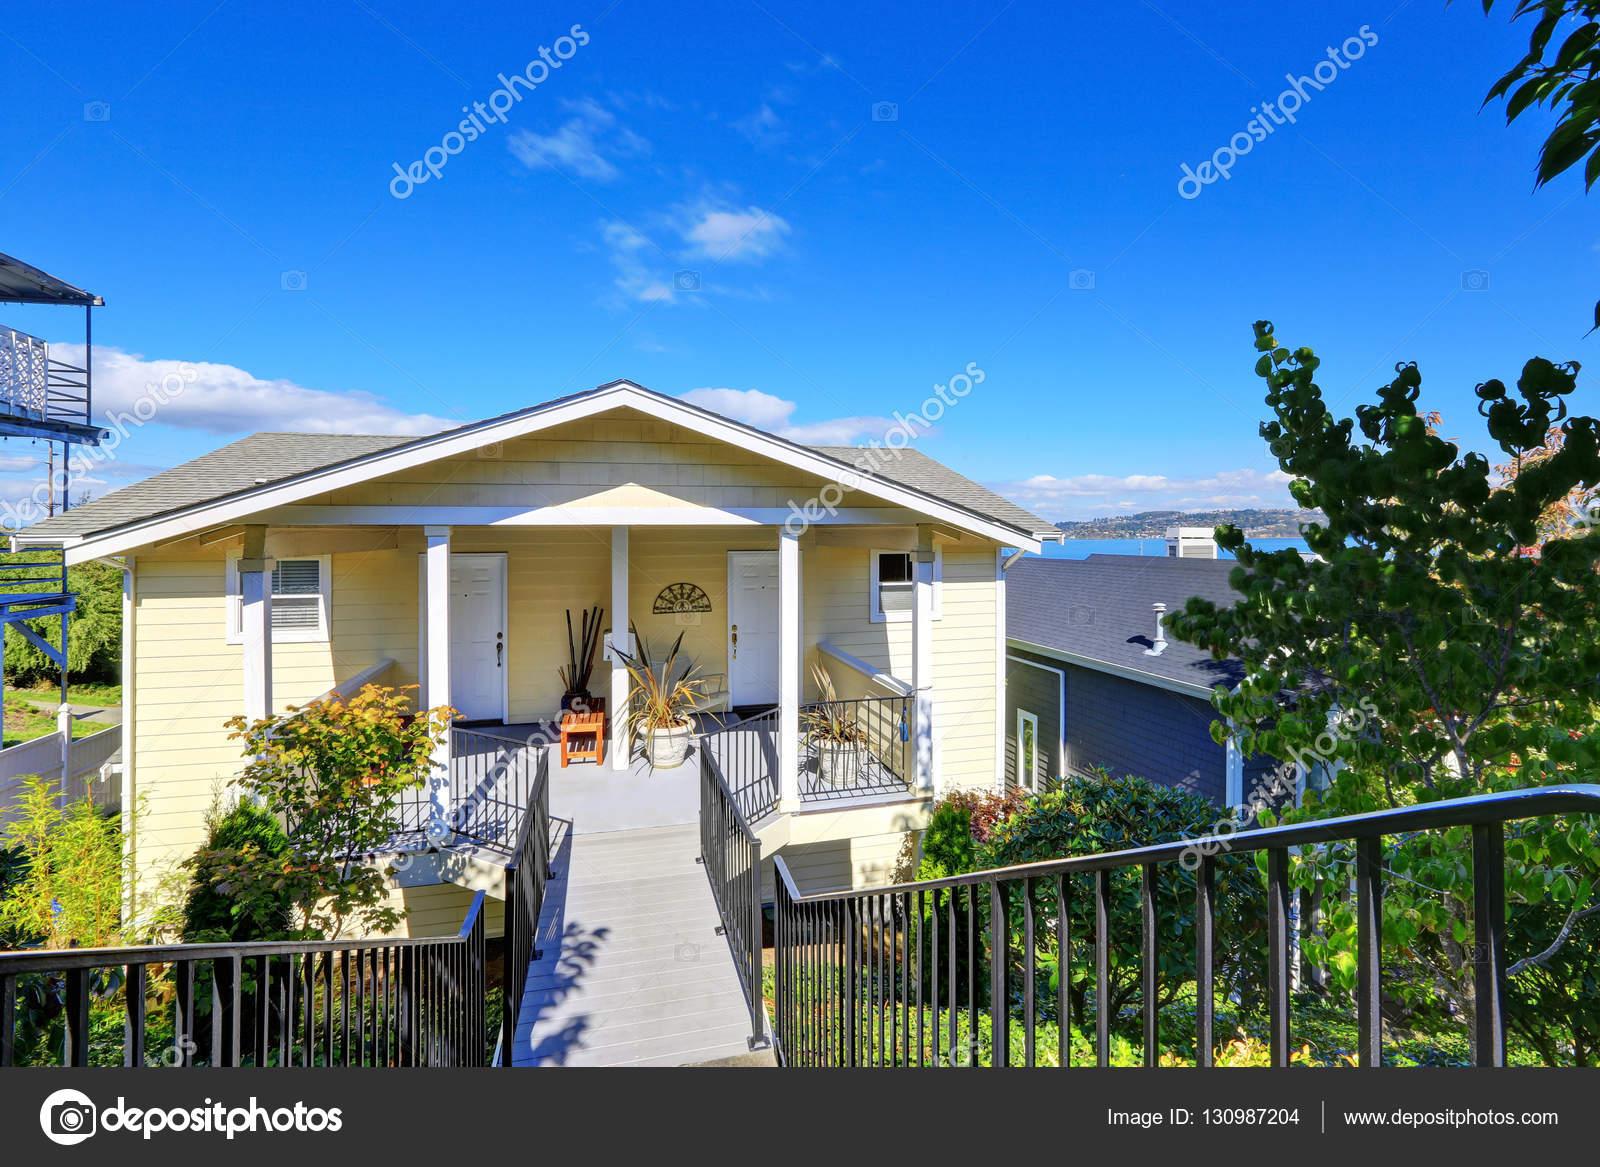 american yellow duplex house on blue sky background stock photo american yellow duplex house on blue sky background northwest usa photo by iriana88w